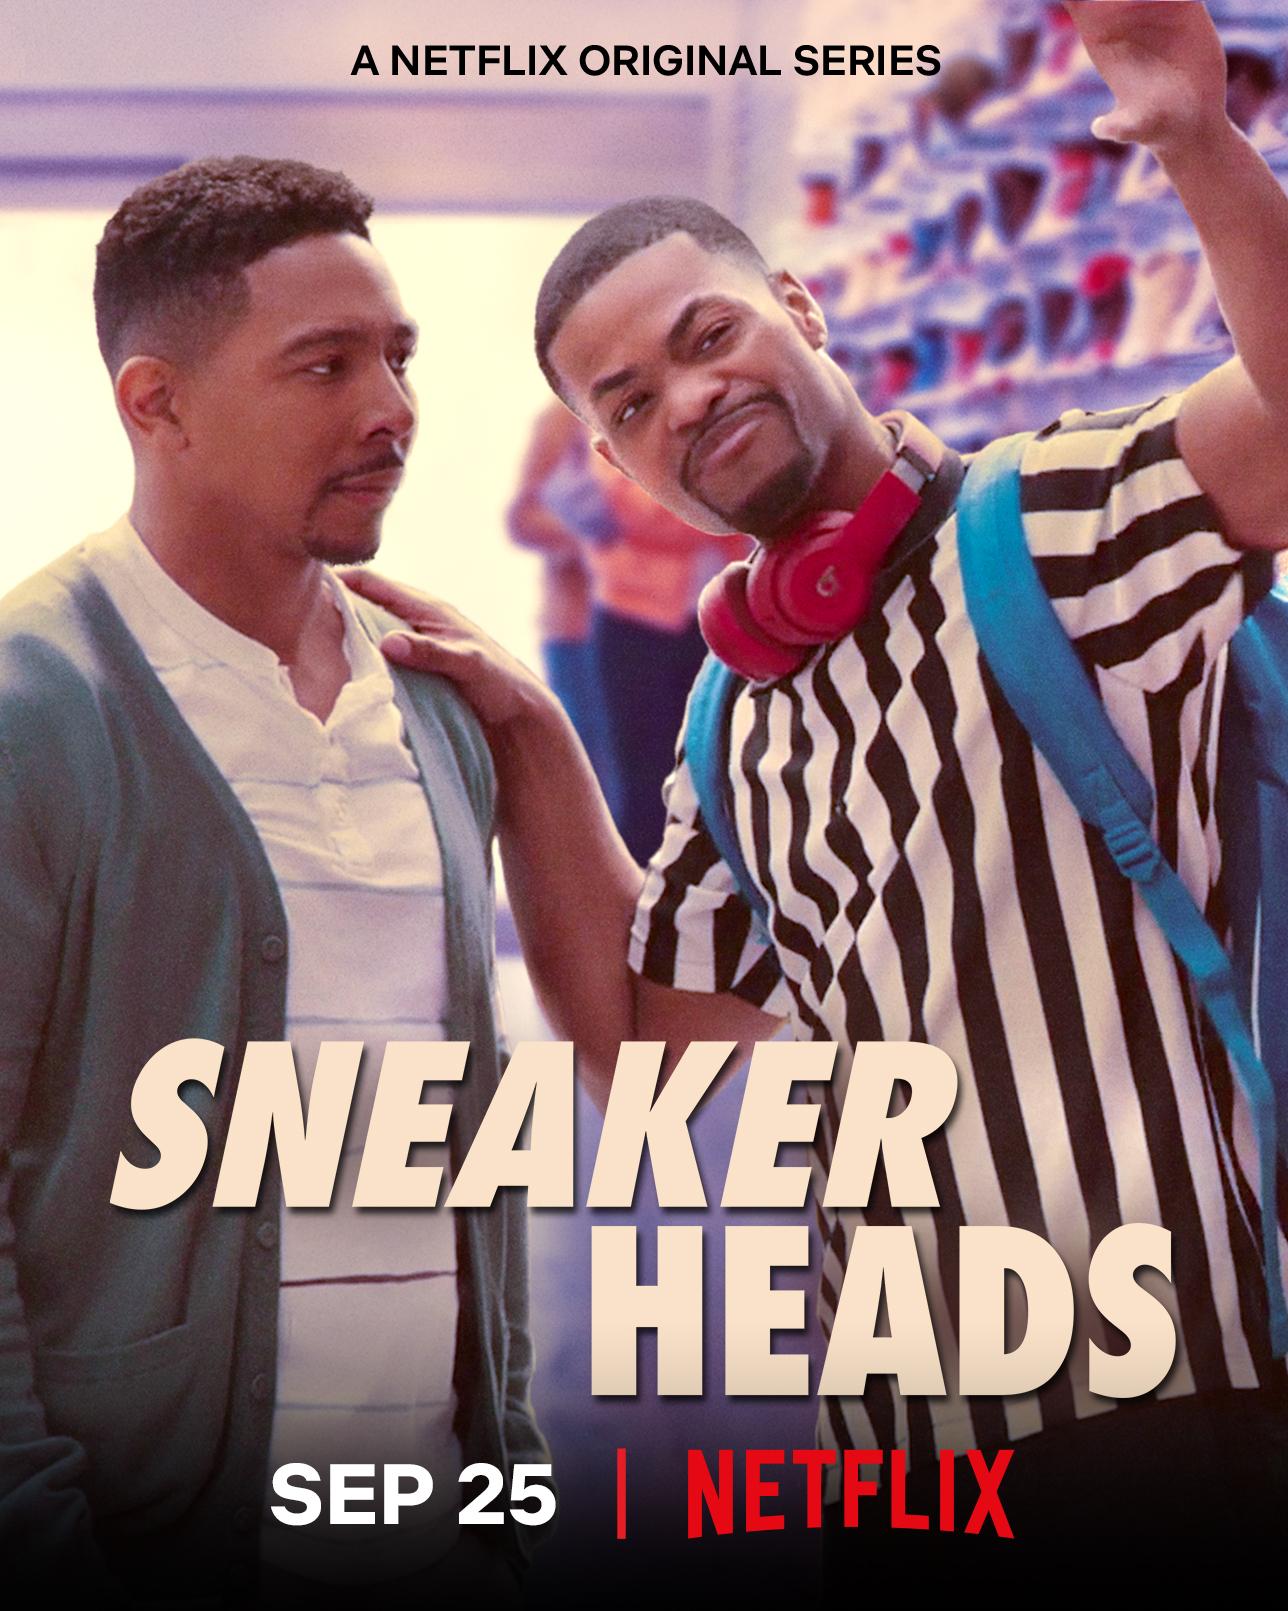 Sneakerheads.S01E01.1080p.WEB.H264-VIDEOHOLE